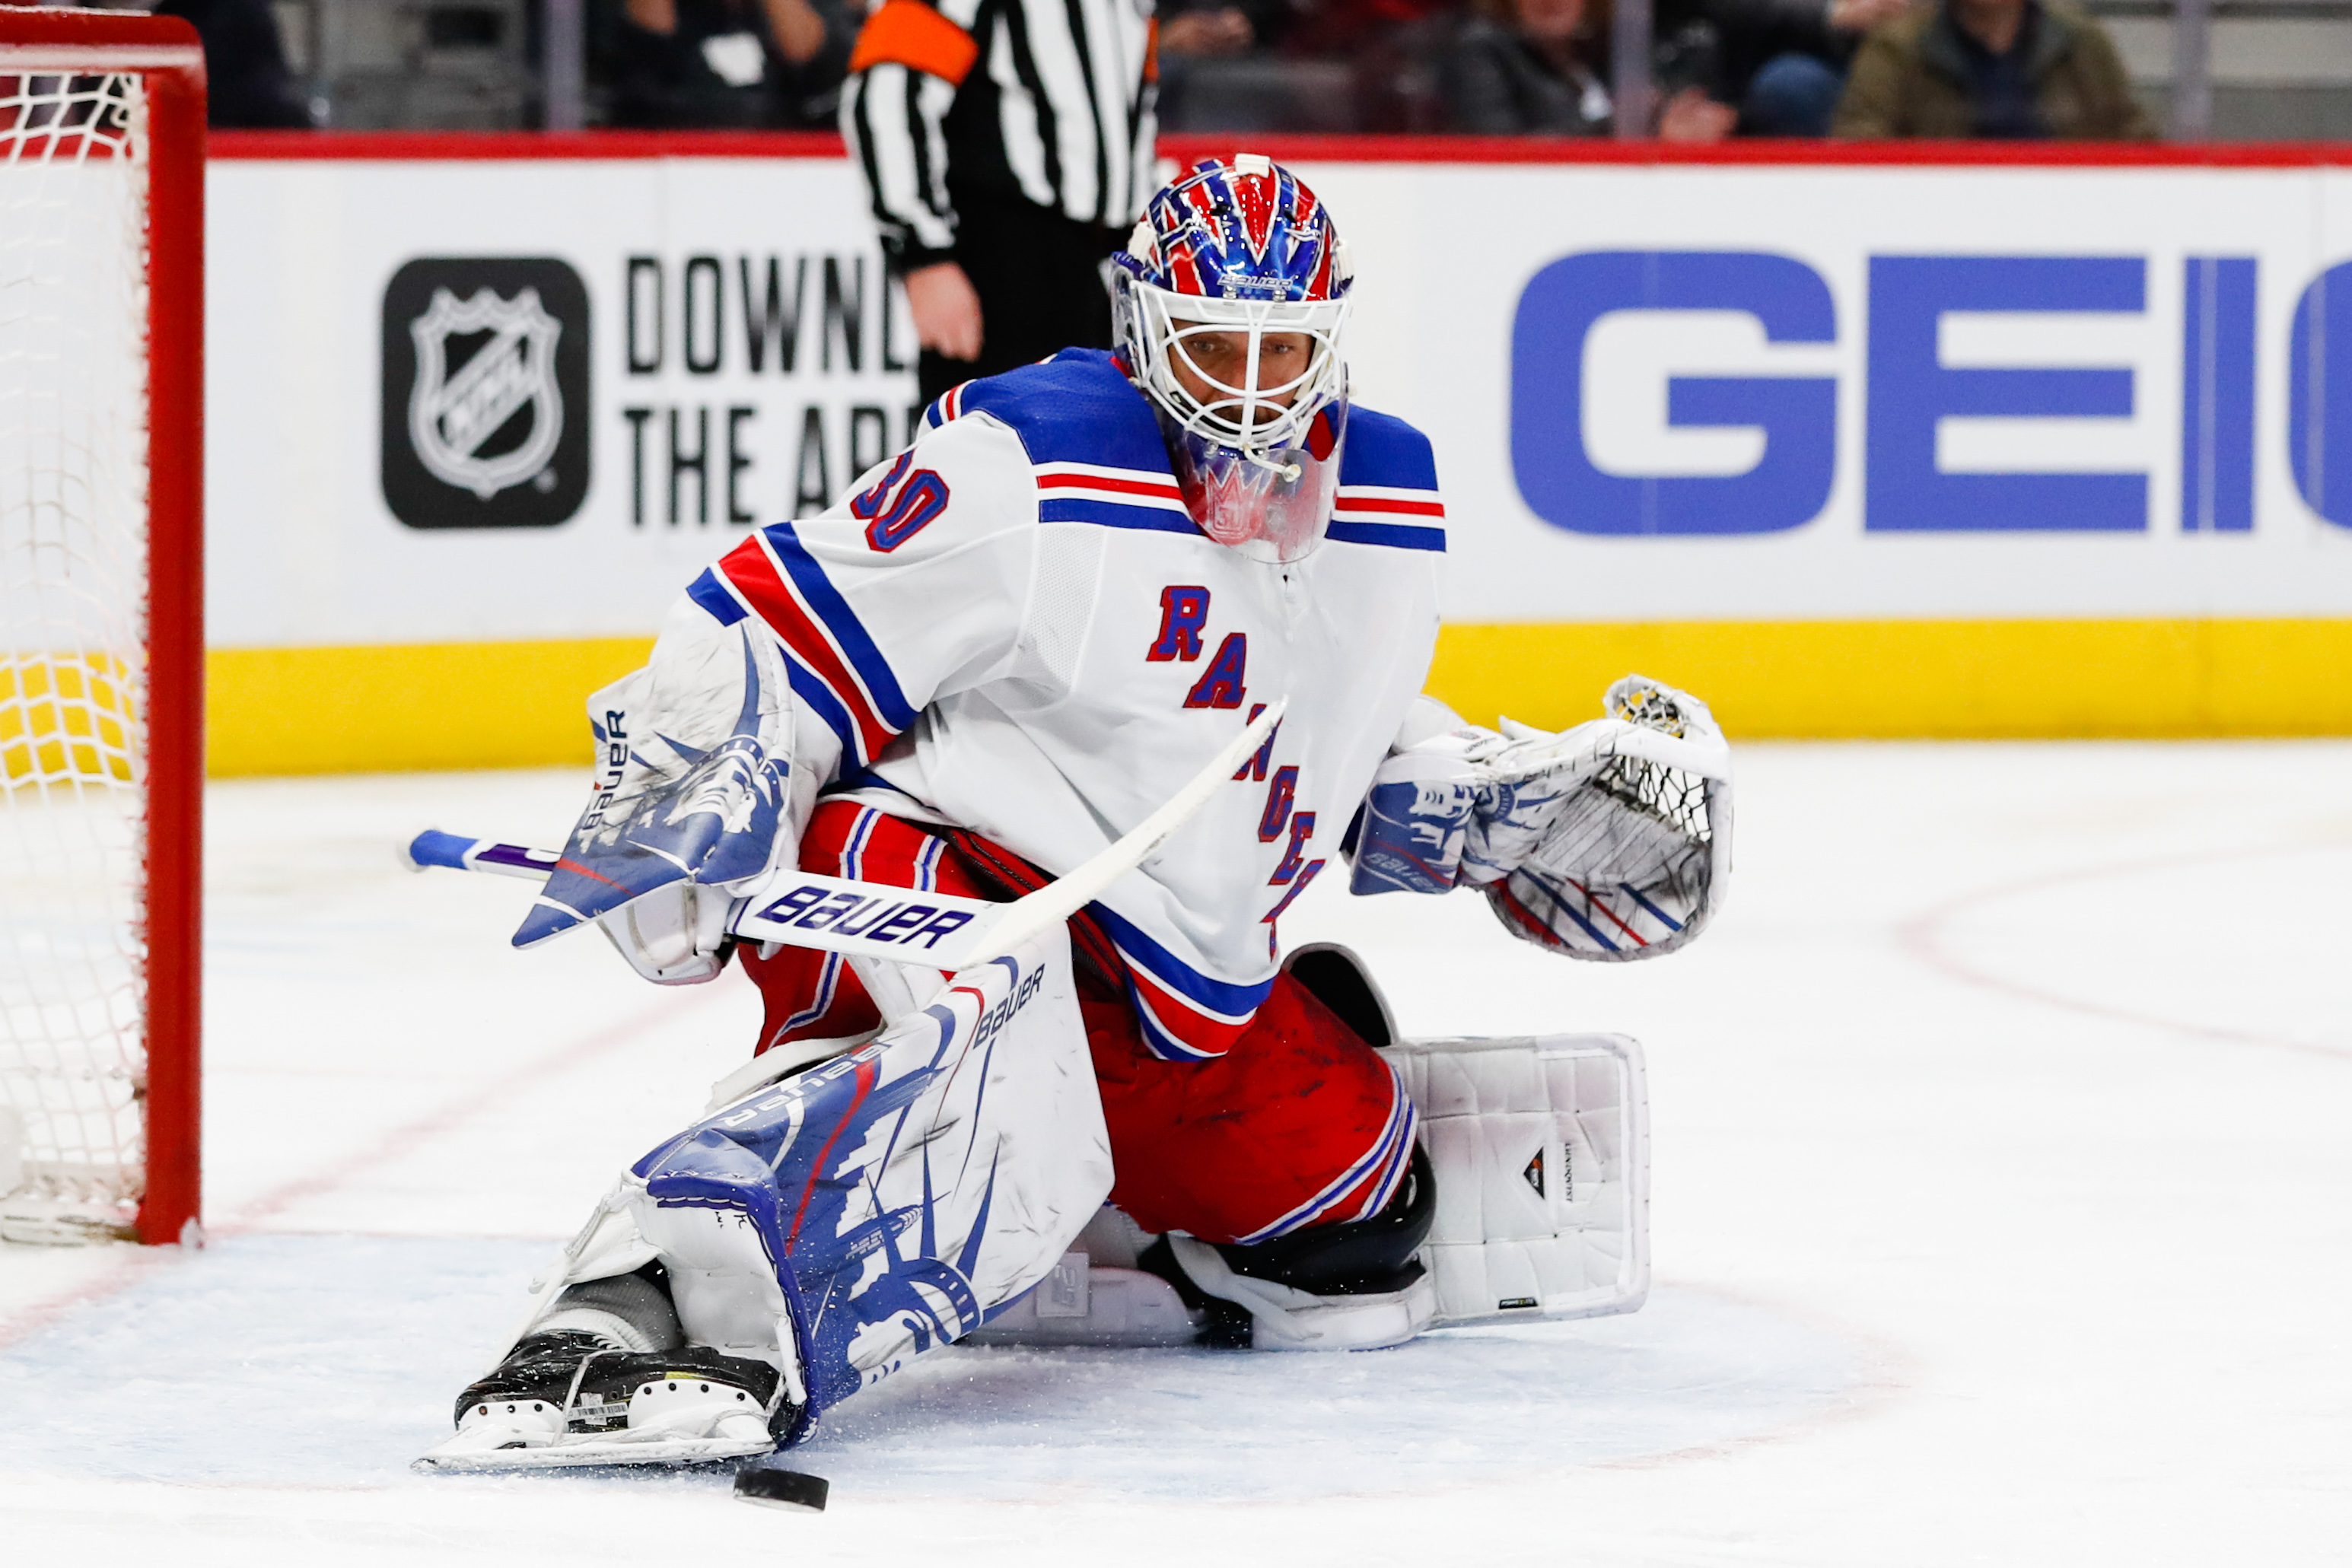 Rangers to retire number 30 jersey of Henrik Lundqvist